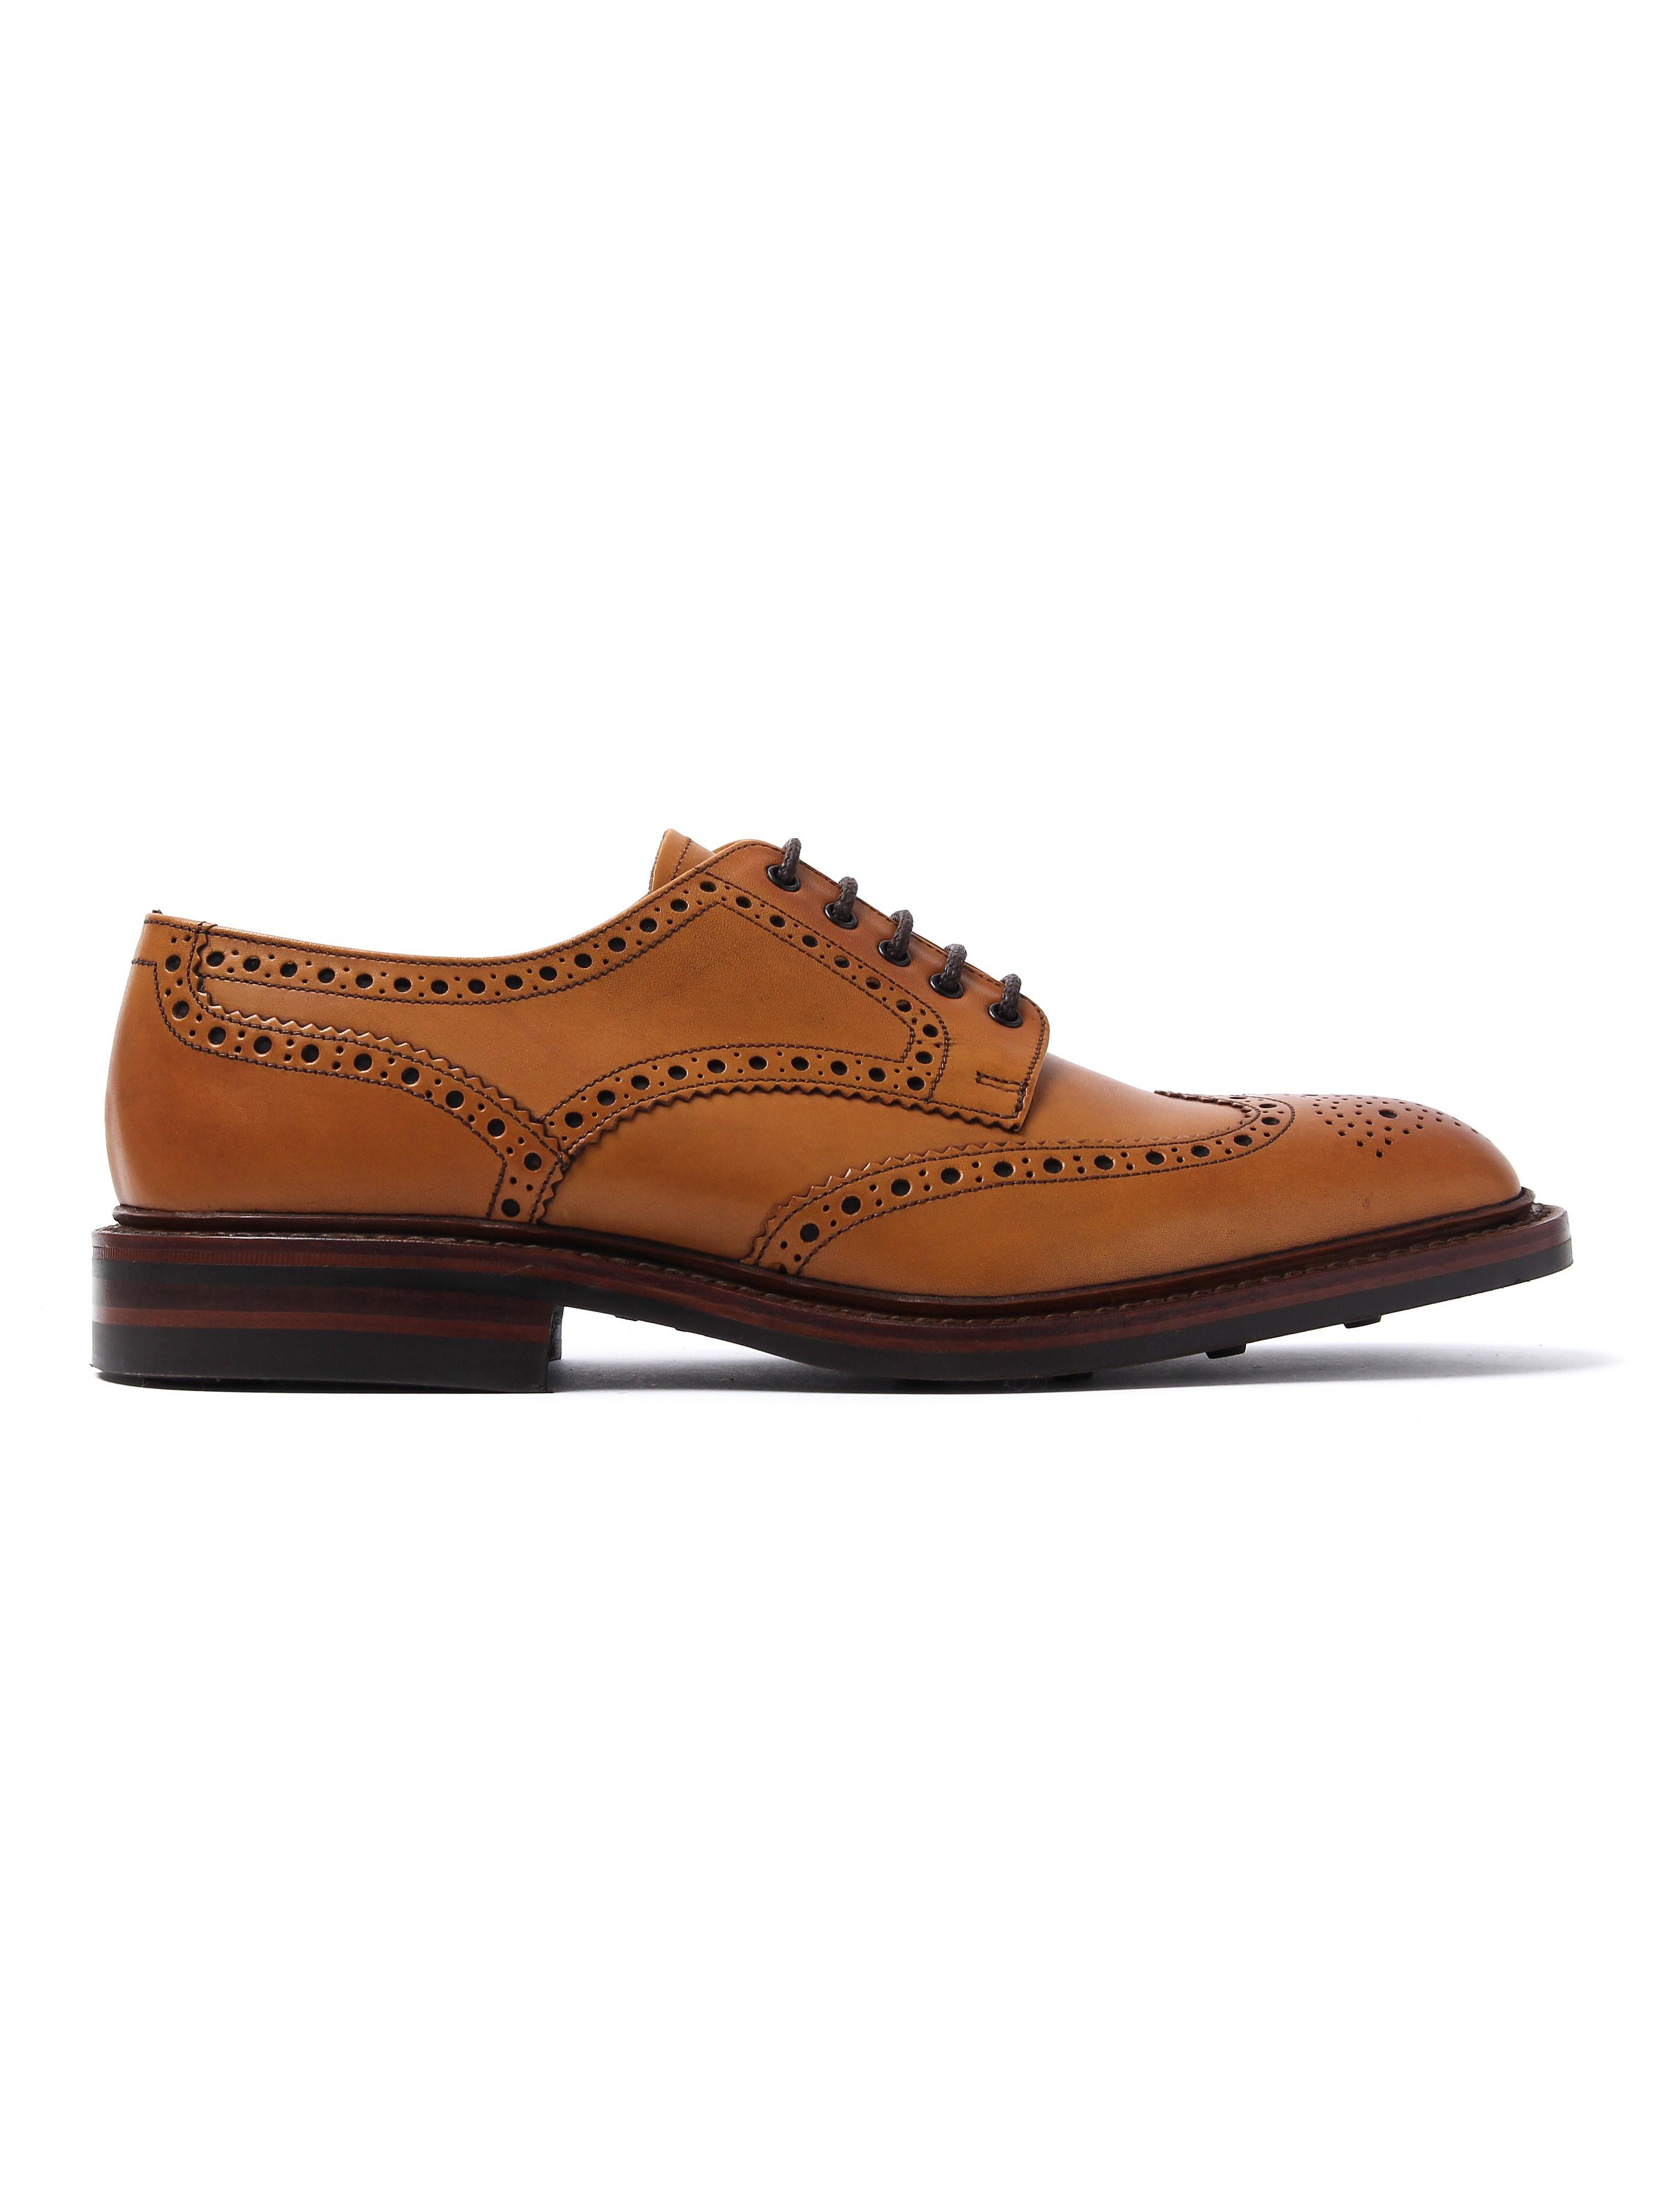 Loake Men's Chester Dainite Brogues - Tan Leather